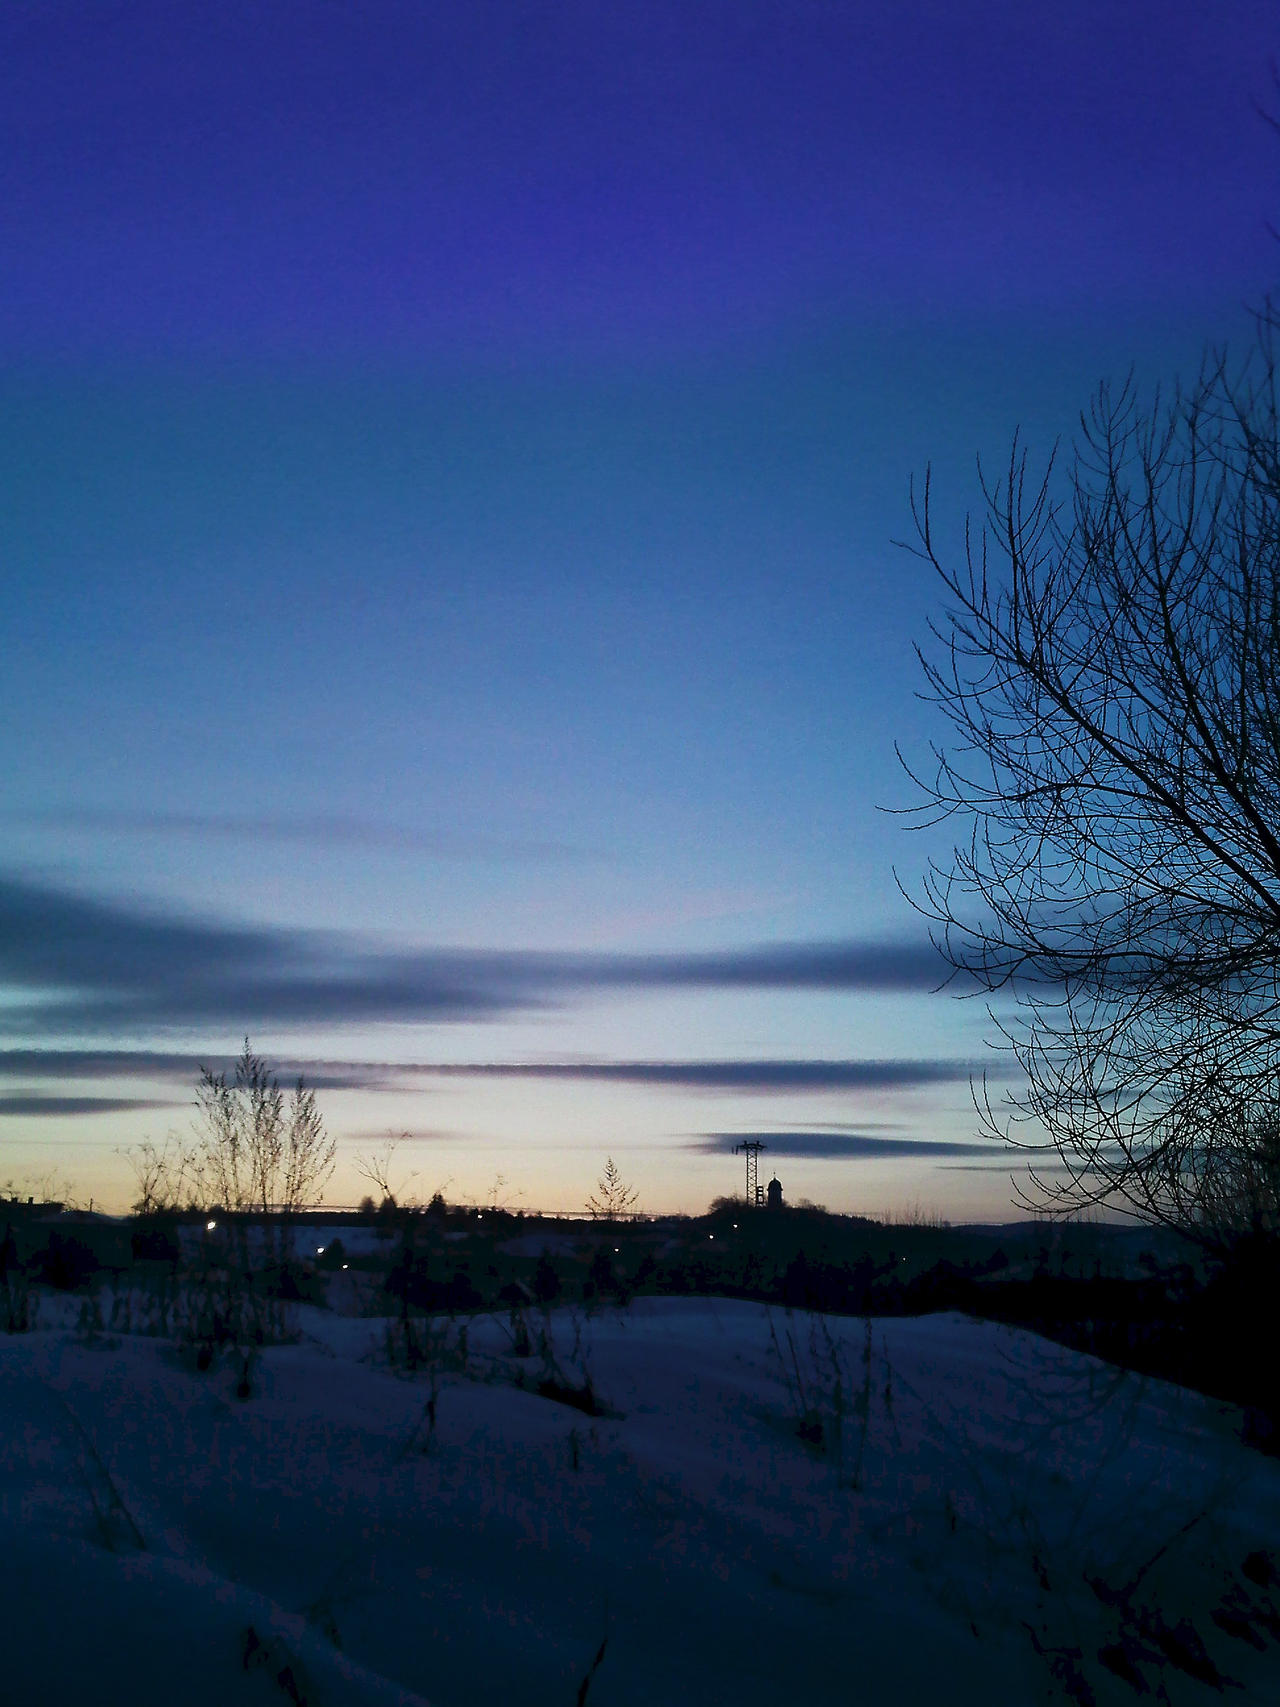 SKY by Nikoleta036